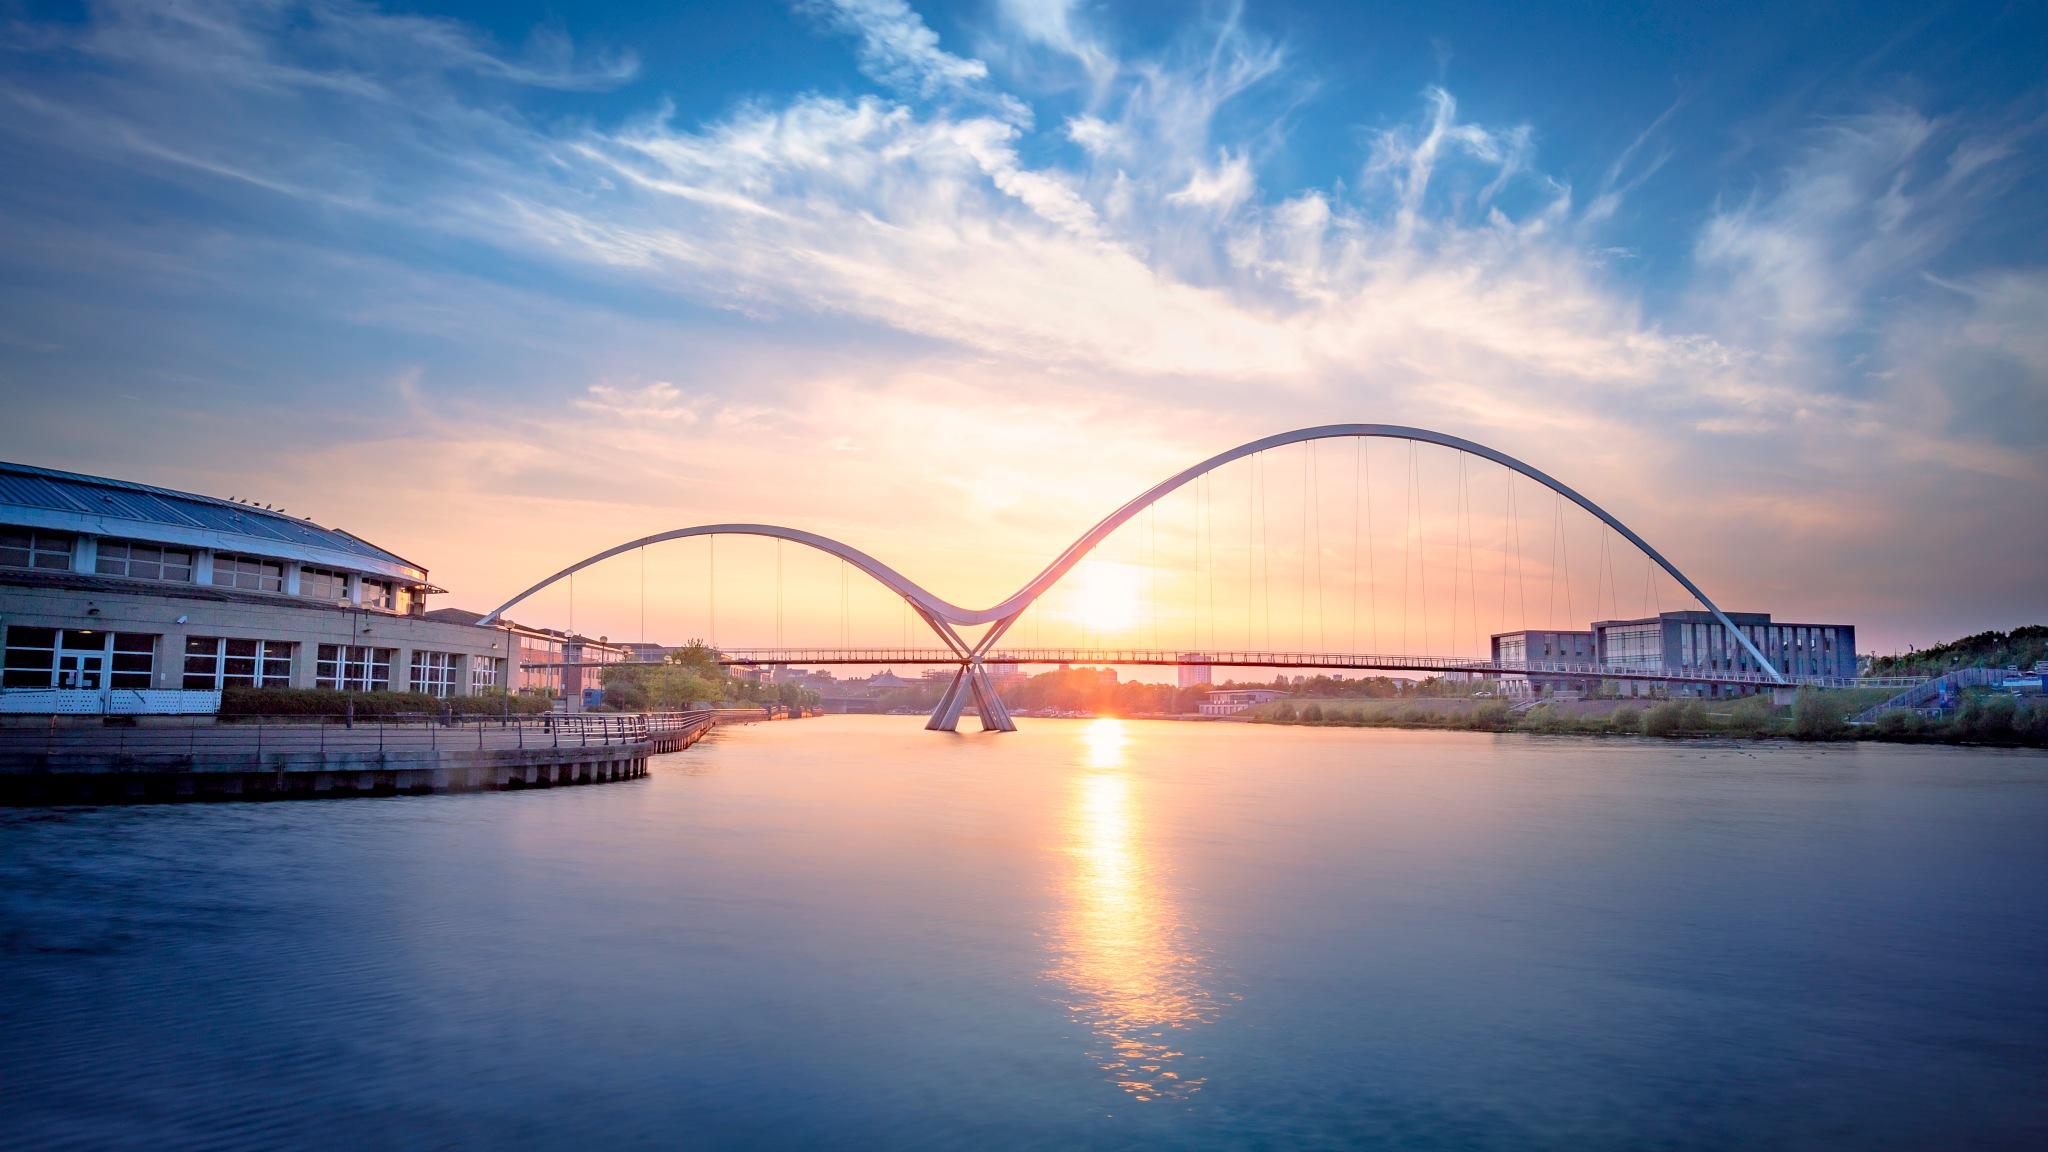 Millennium Bridge by Tony Shaw